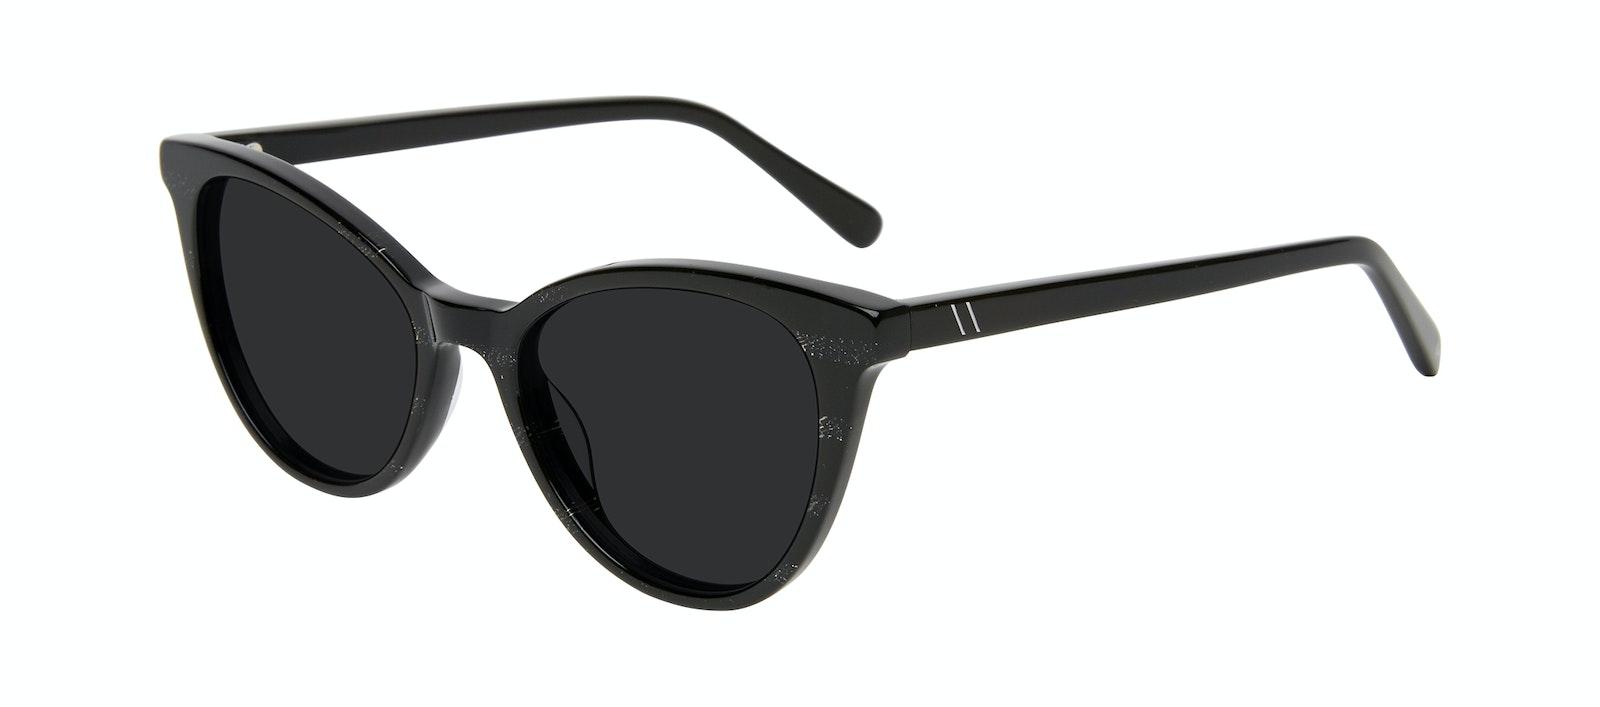 Affordable Fashion Glasses Cat Eye Sunglasses Women Victoire Night Tilt